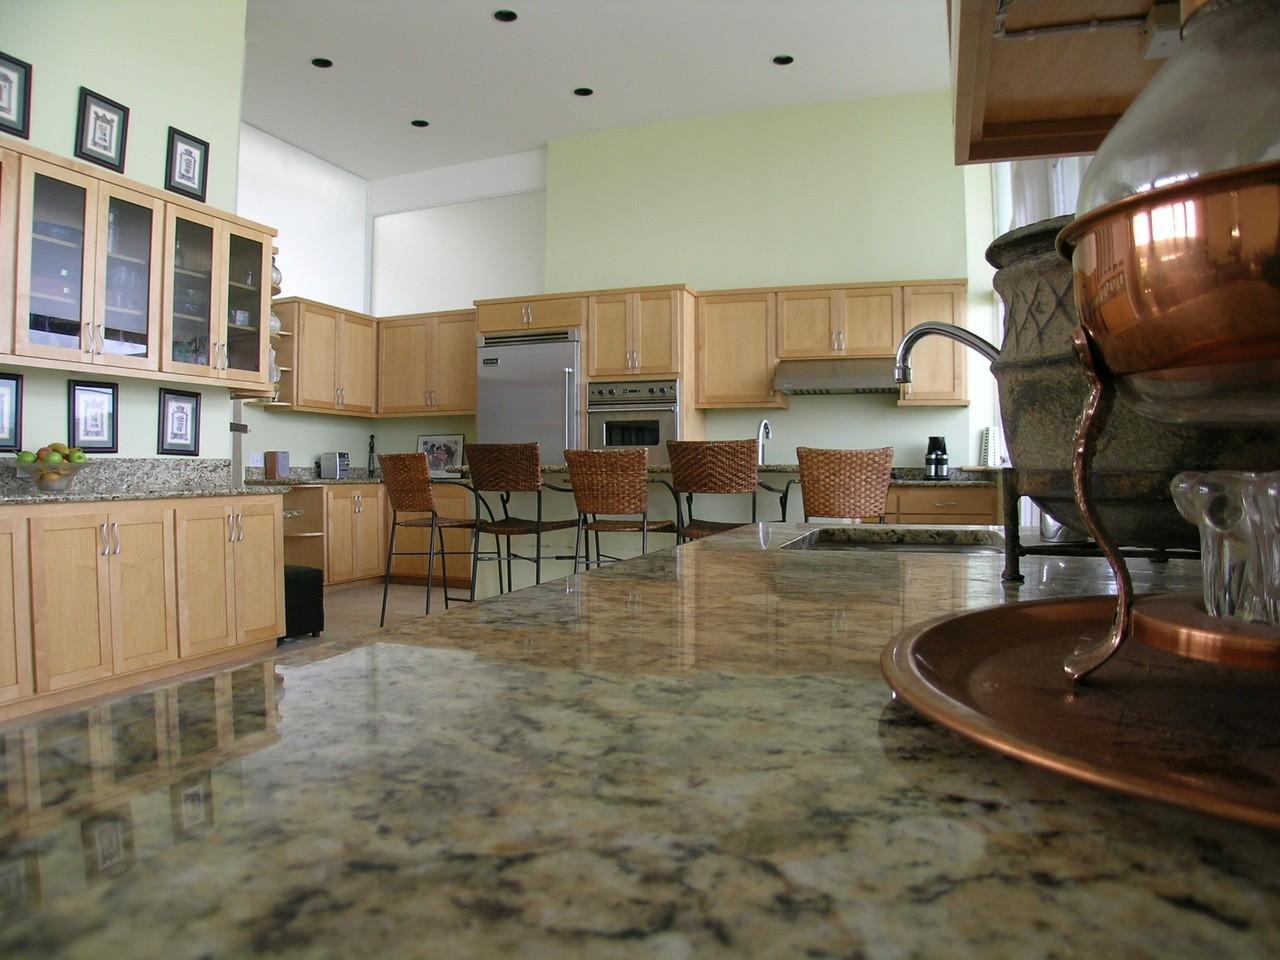 Jakie meble kupić do kuchni?